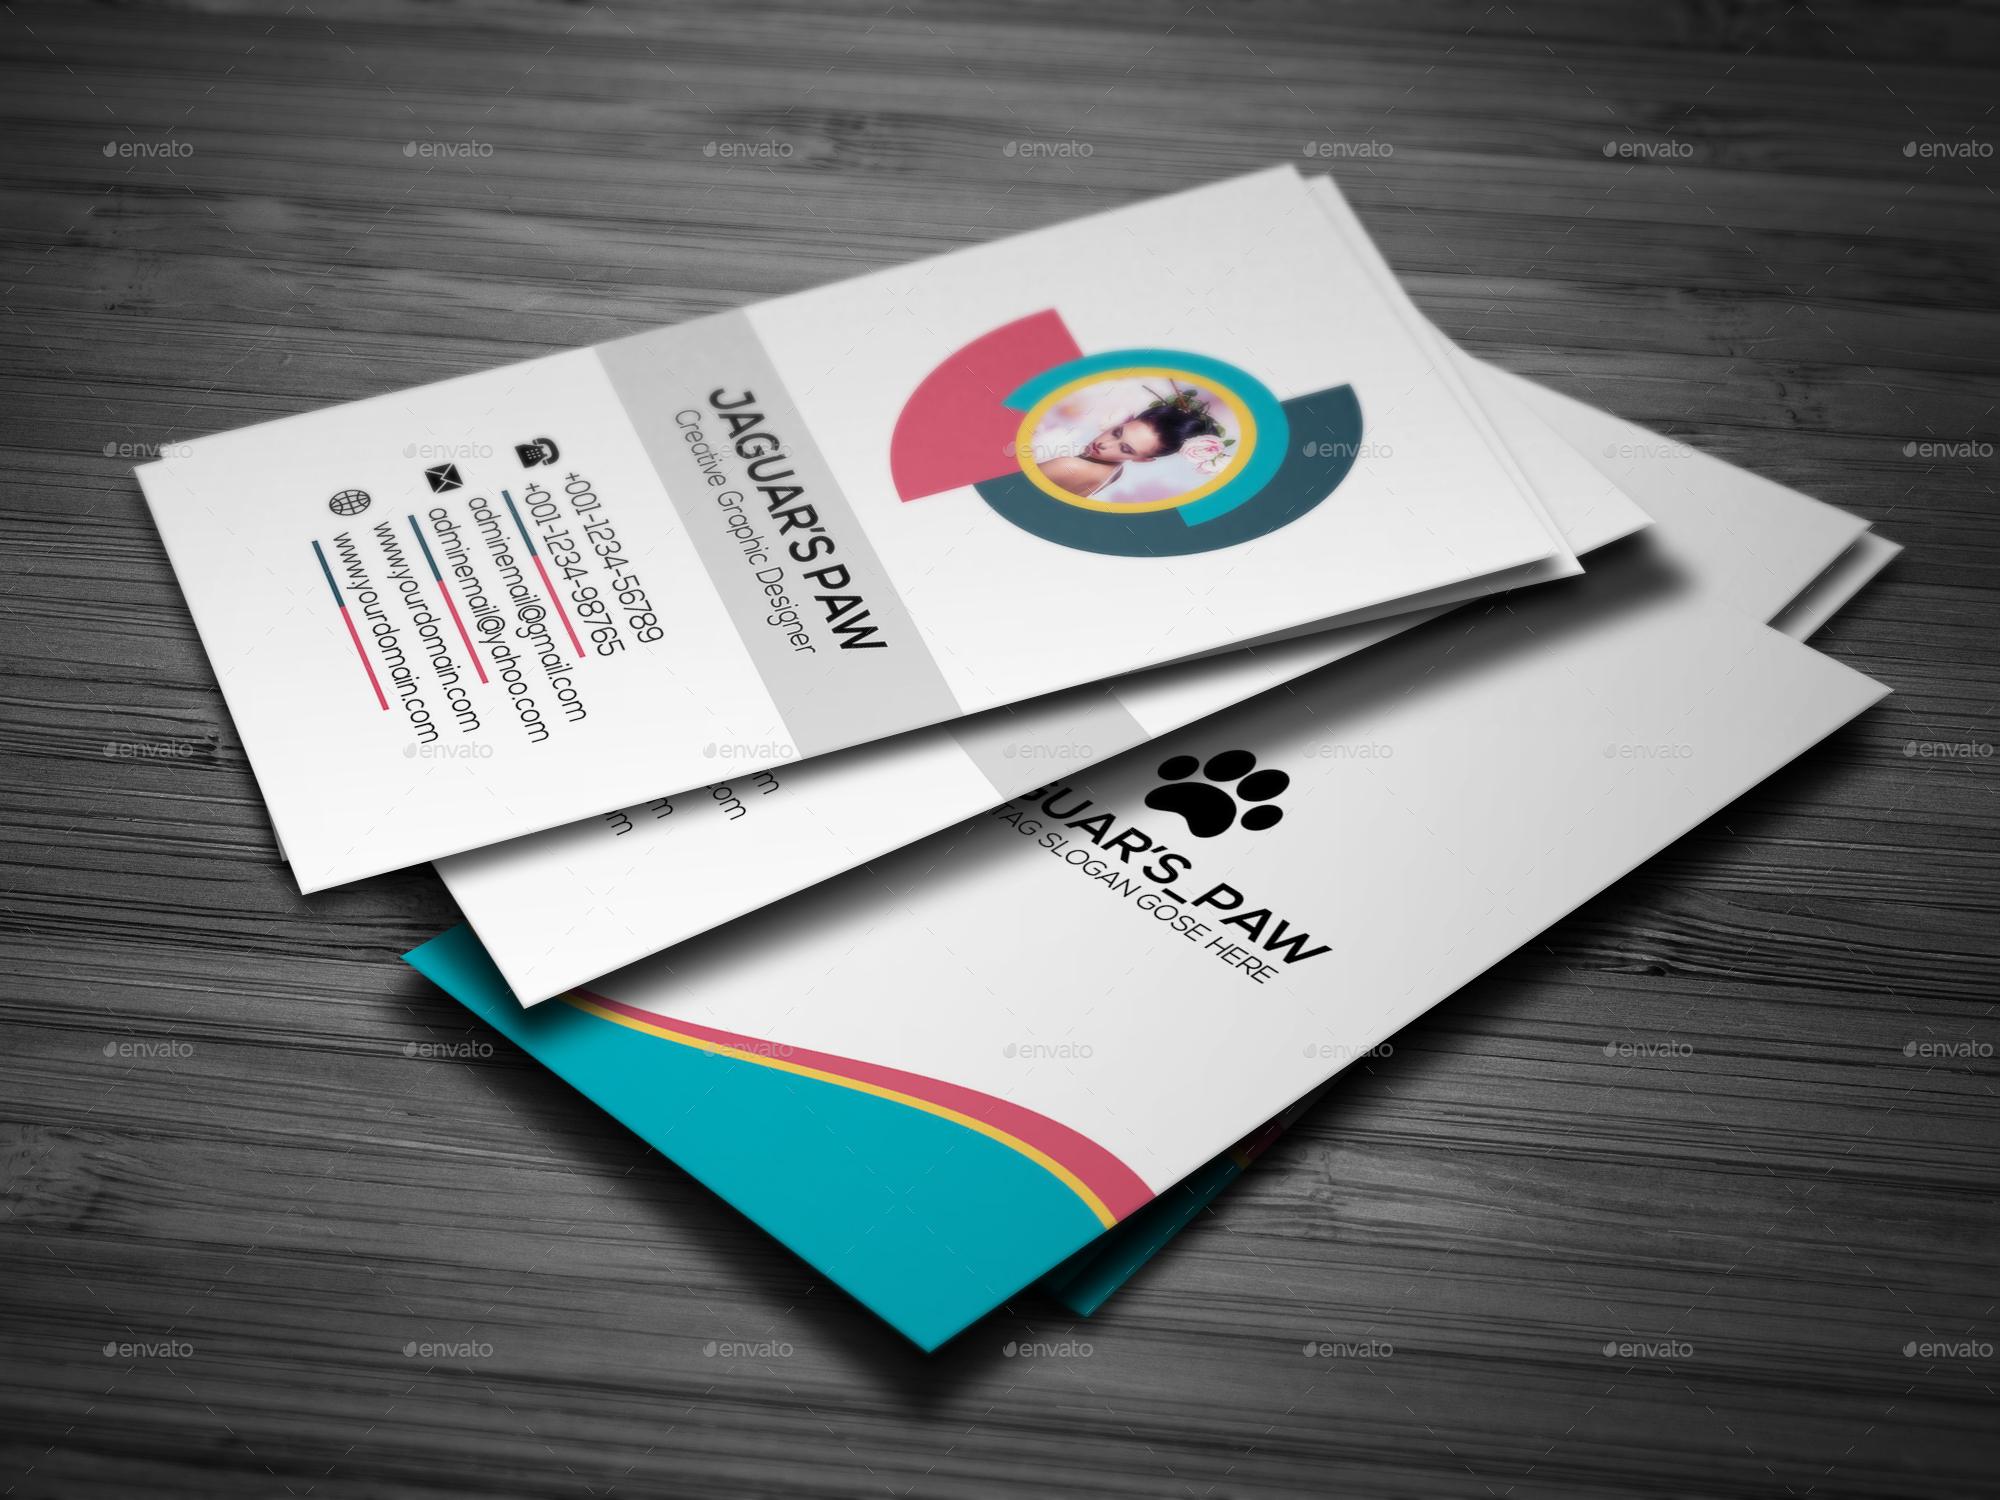 spa business cards - Paso.evolist.co